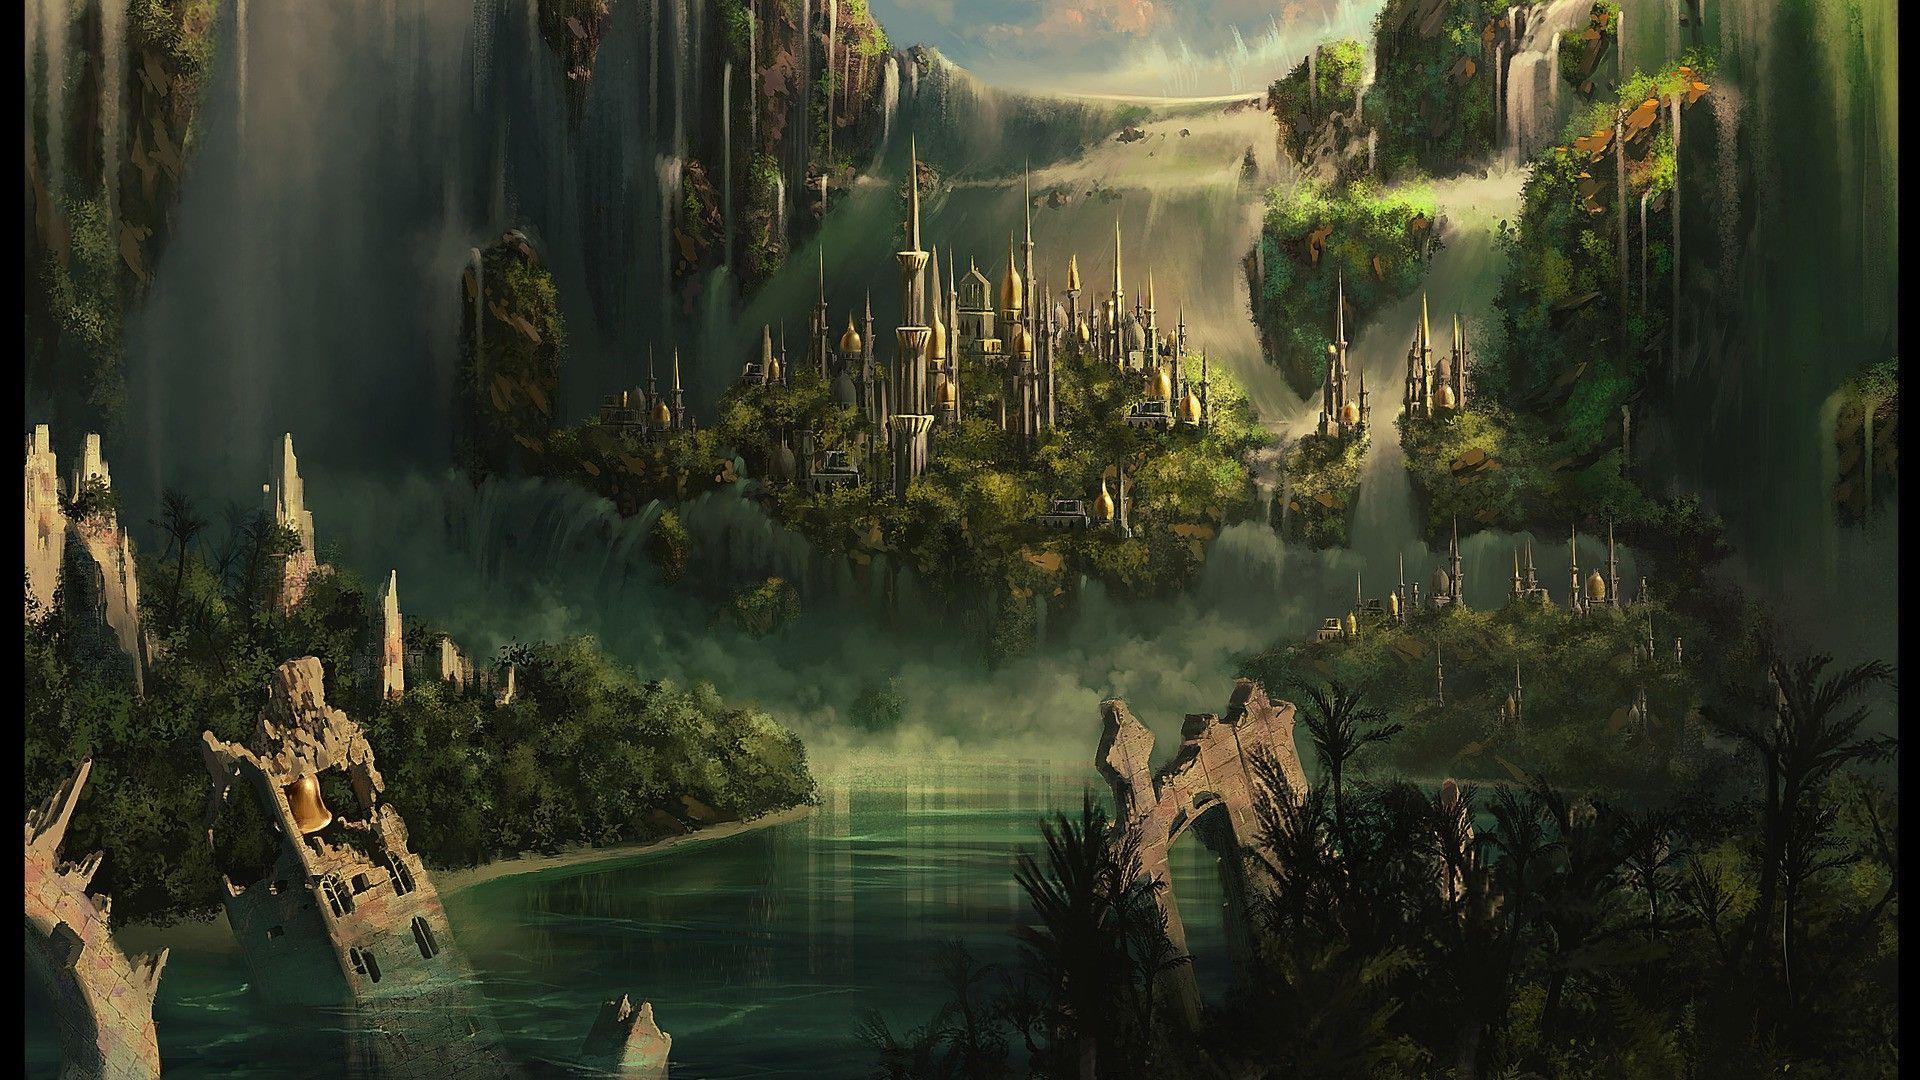 Kingdom among the jungle waterfall wallpaper 14735 1920x1080